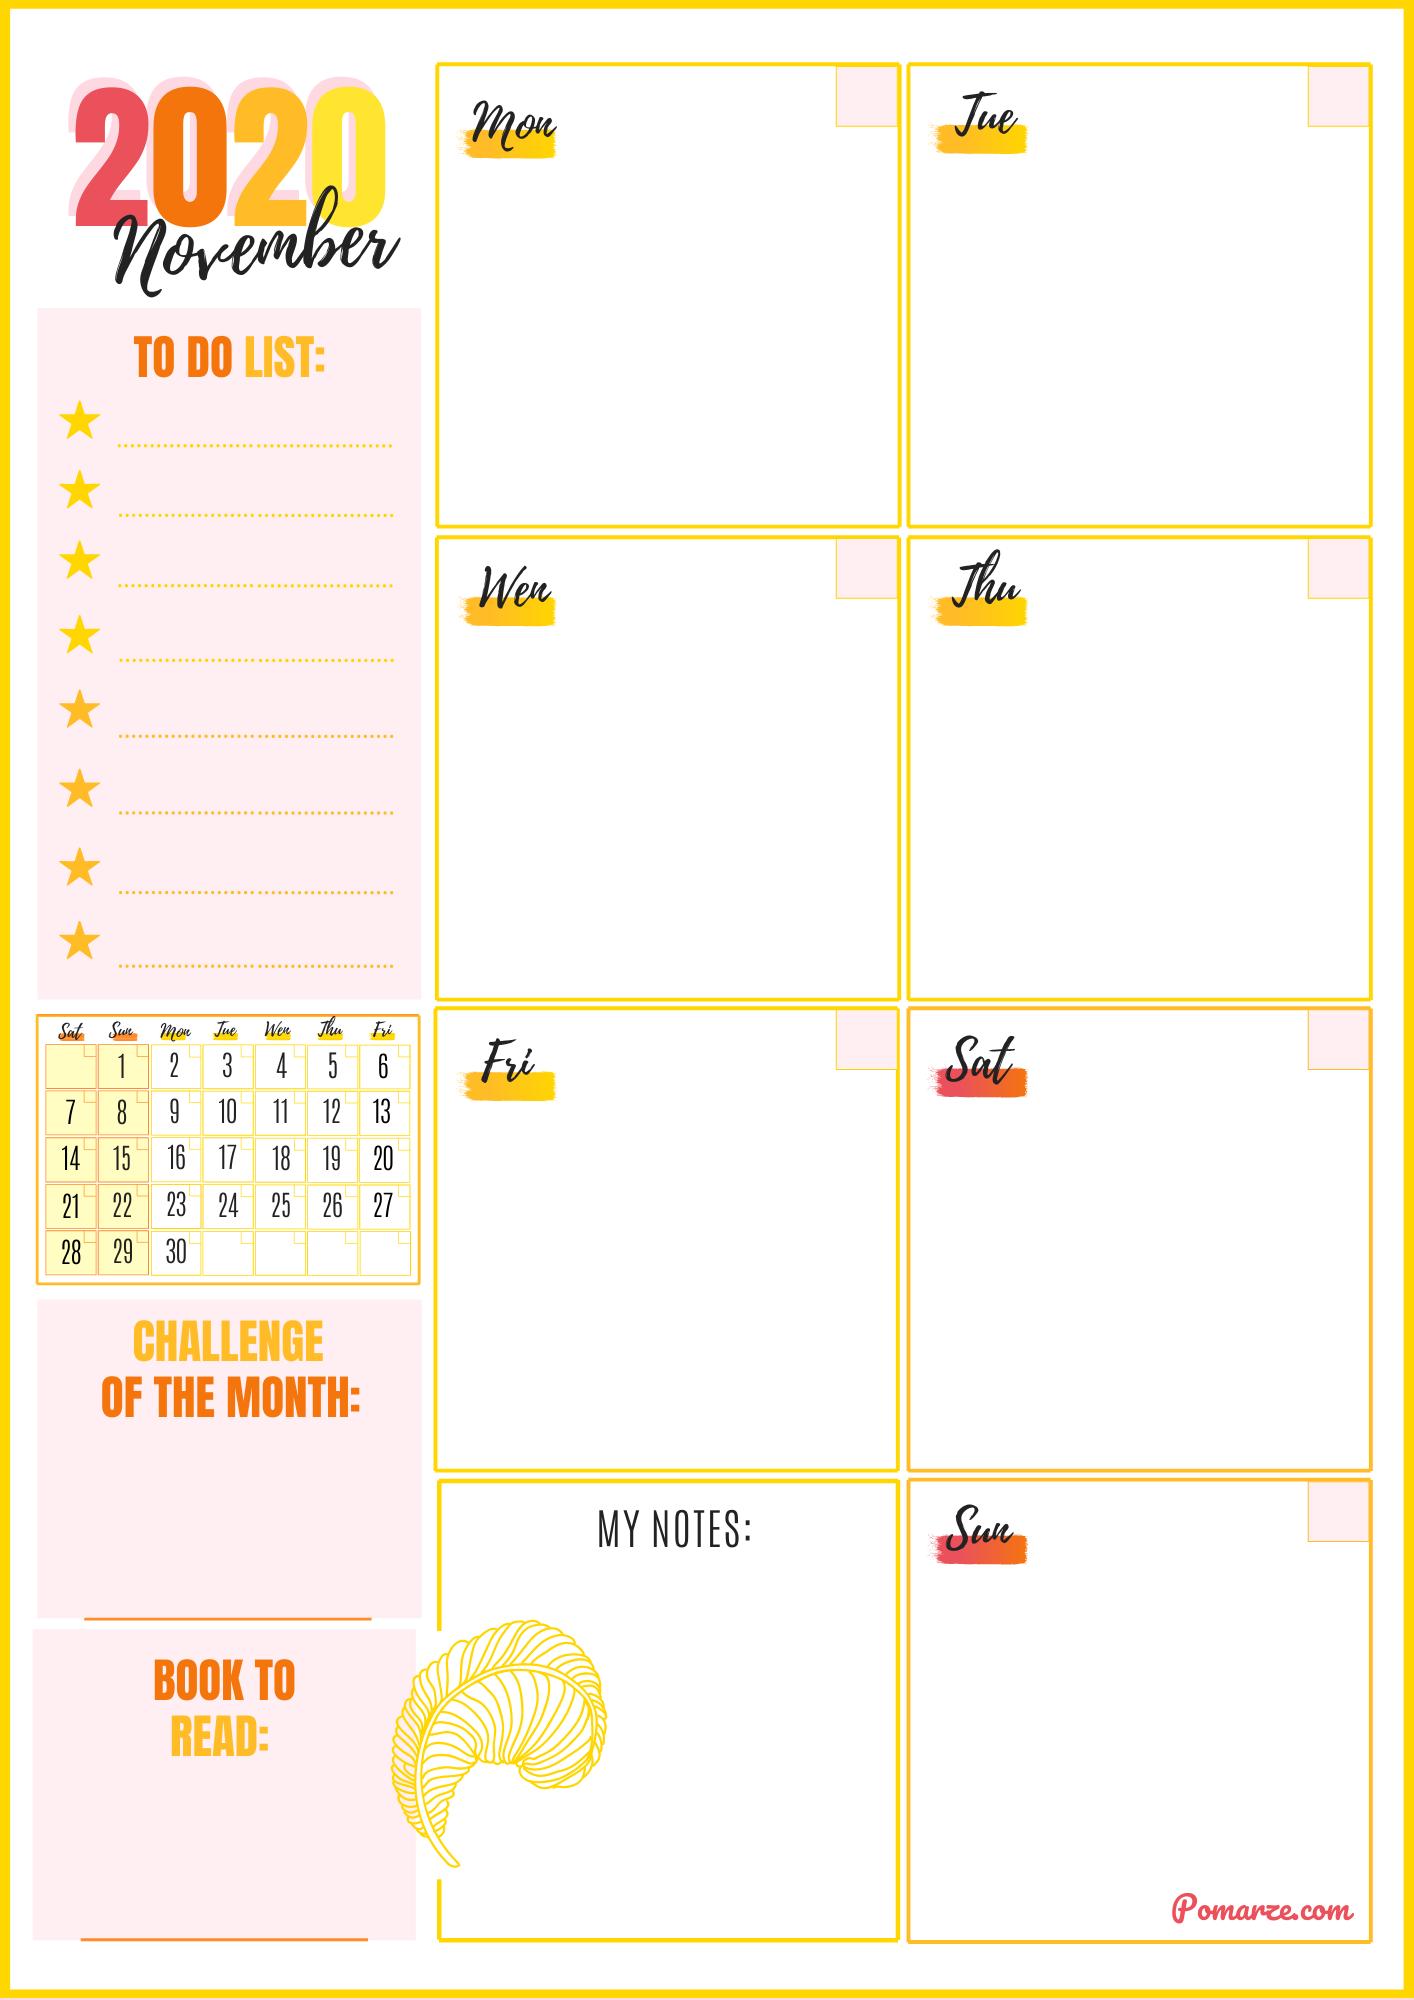 Weekly planner & calendar planner November 2020 color